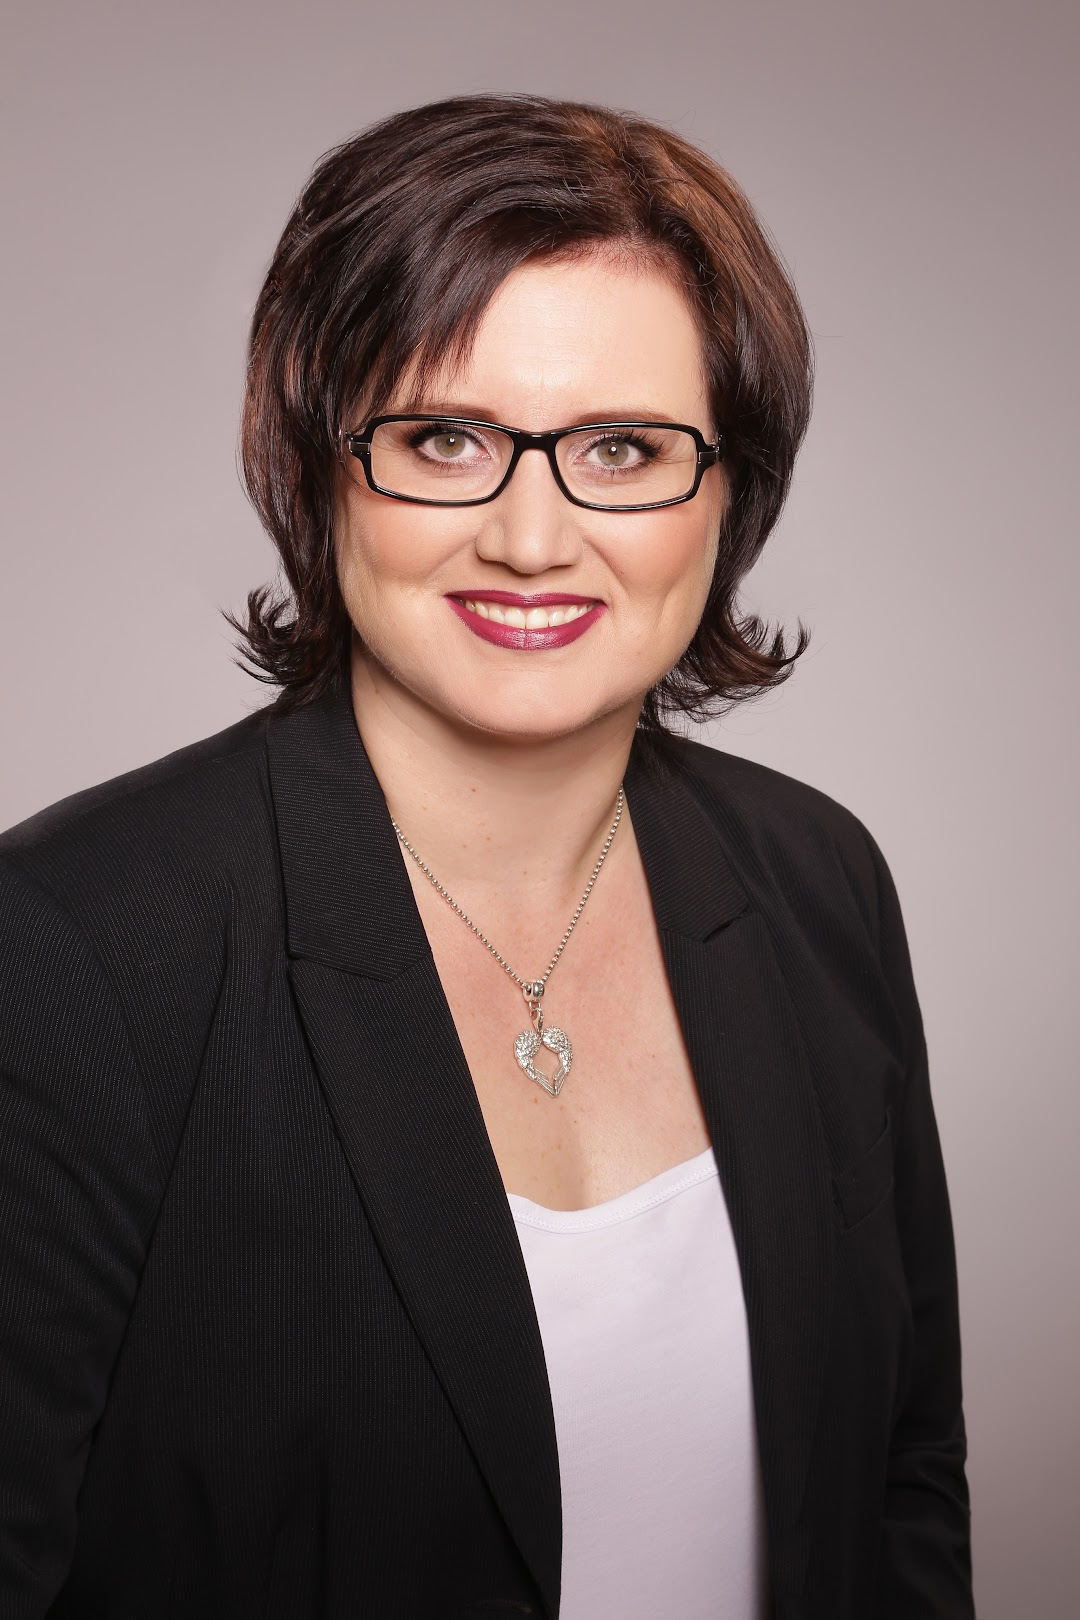 Steuerberaterin Melanie Meurer